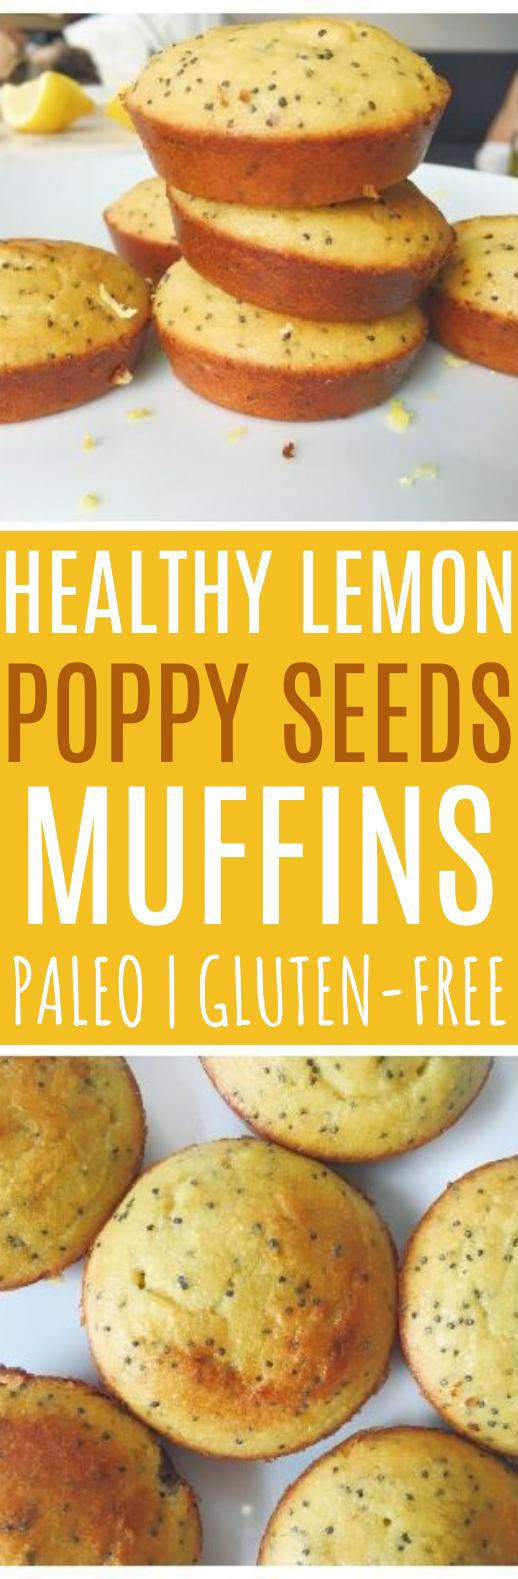 Healthy Lemon Poppy Seed Muffins #breakfast #healthy #paleo #muffins #diet